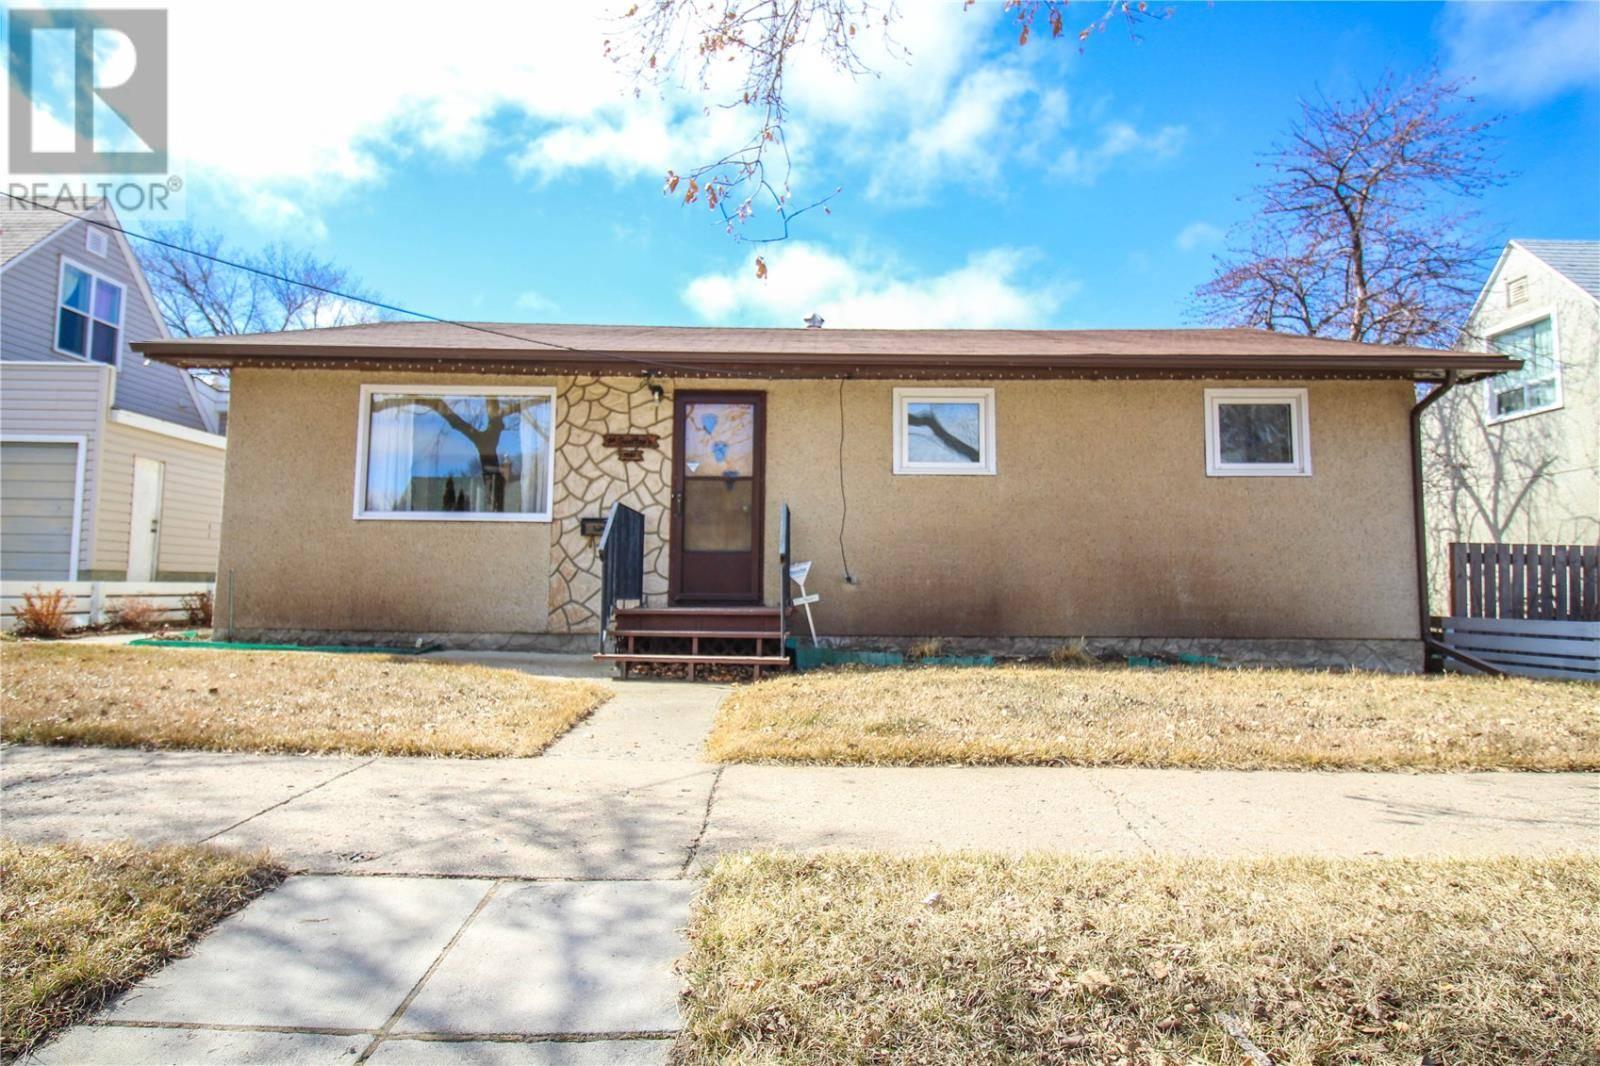 House for sale at 1561 97th St North Battleford Saskatchewan - MLS: SK764419